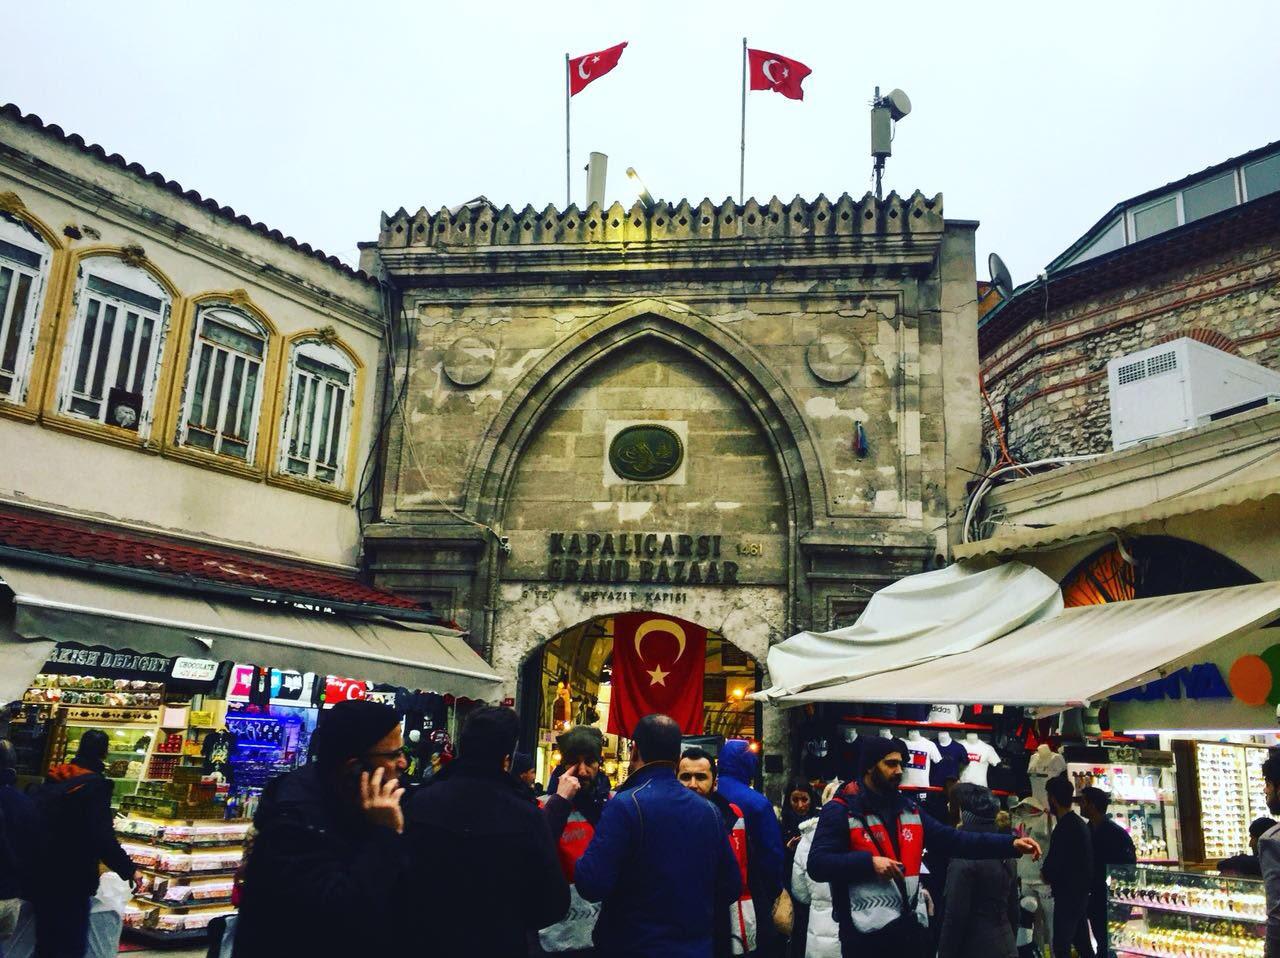 Grand Bazaar, Sultanahmet, Istanbul, Turkey